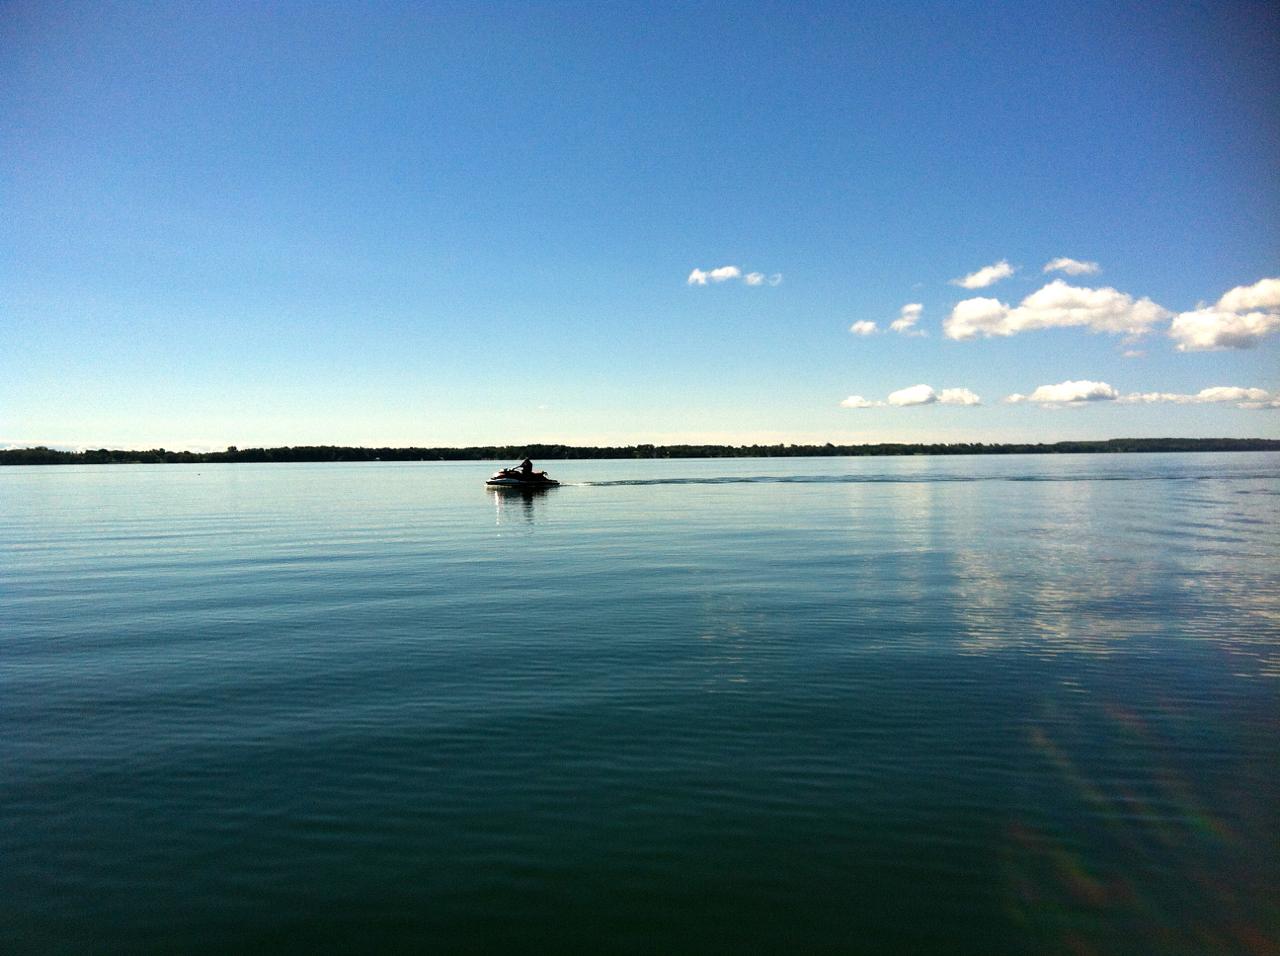 Bay of Quinte Sea Doo Tour